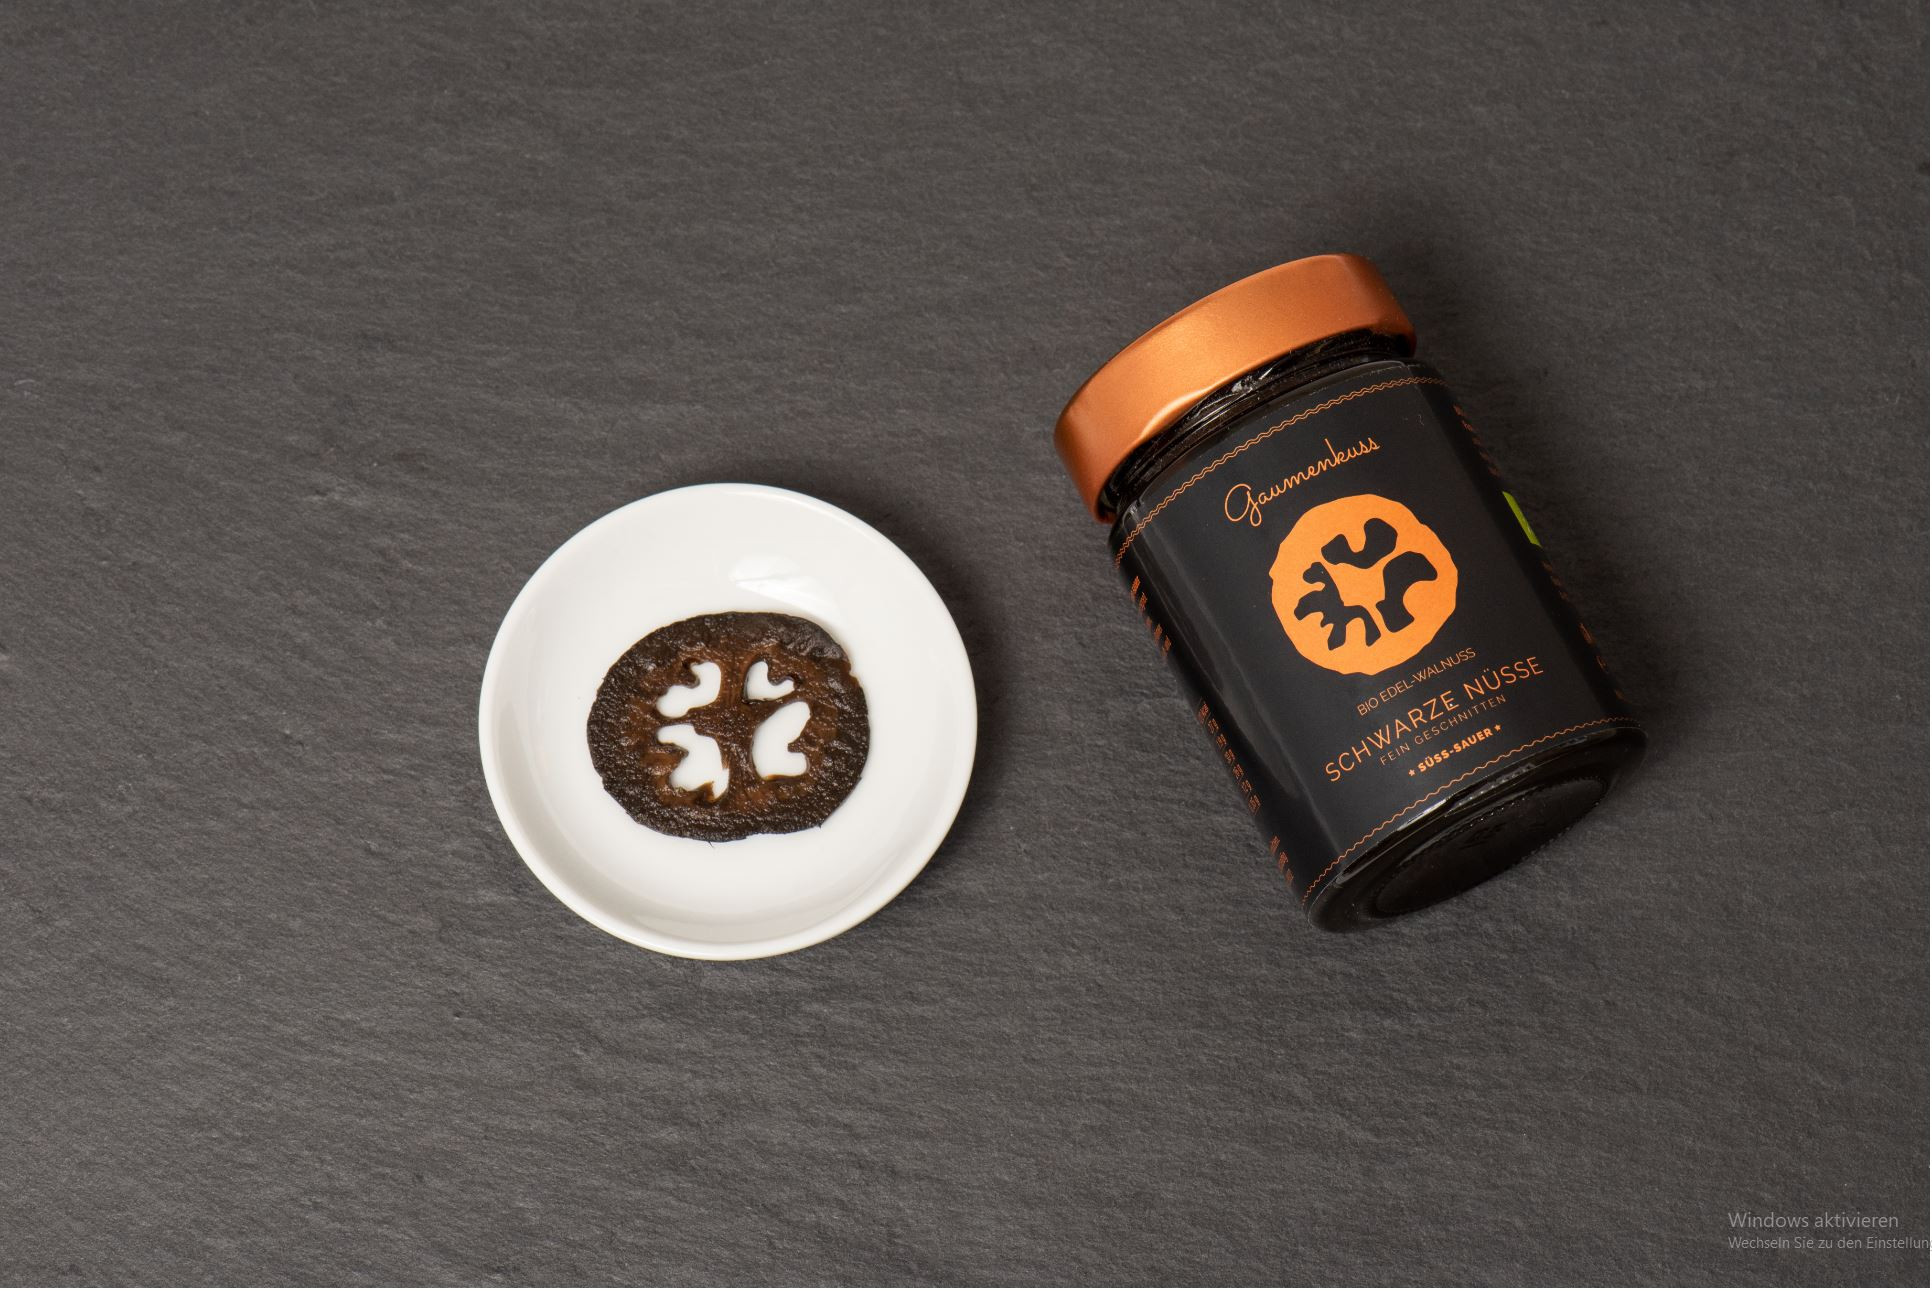 BIO Schwarze Nuss - fein geschnitten, süss-sauer, mind. 12 Monate gereift